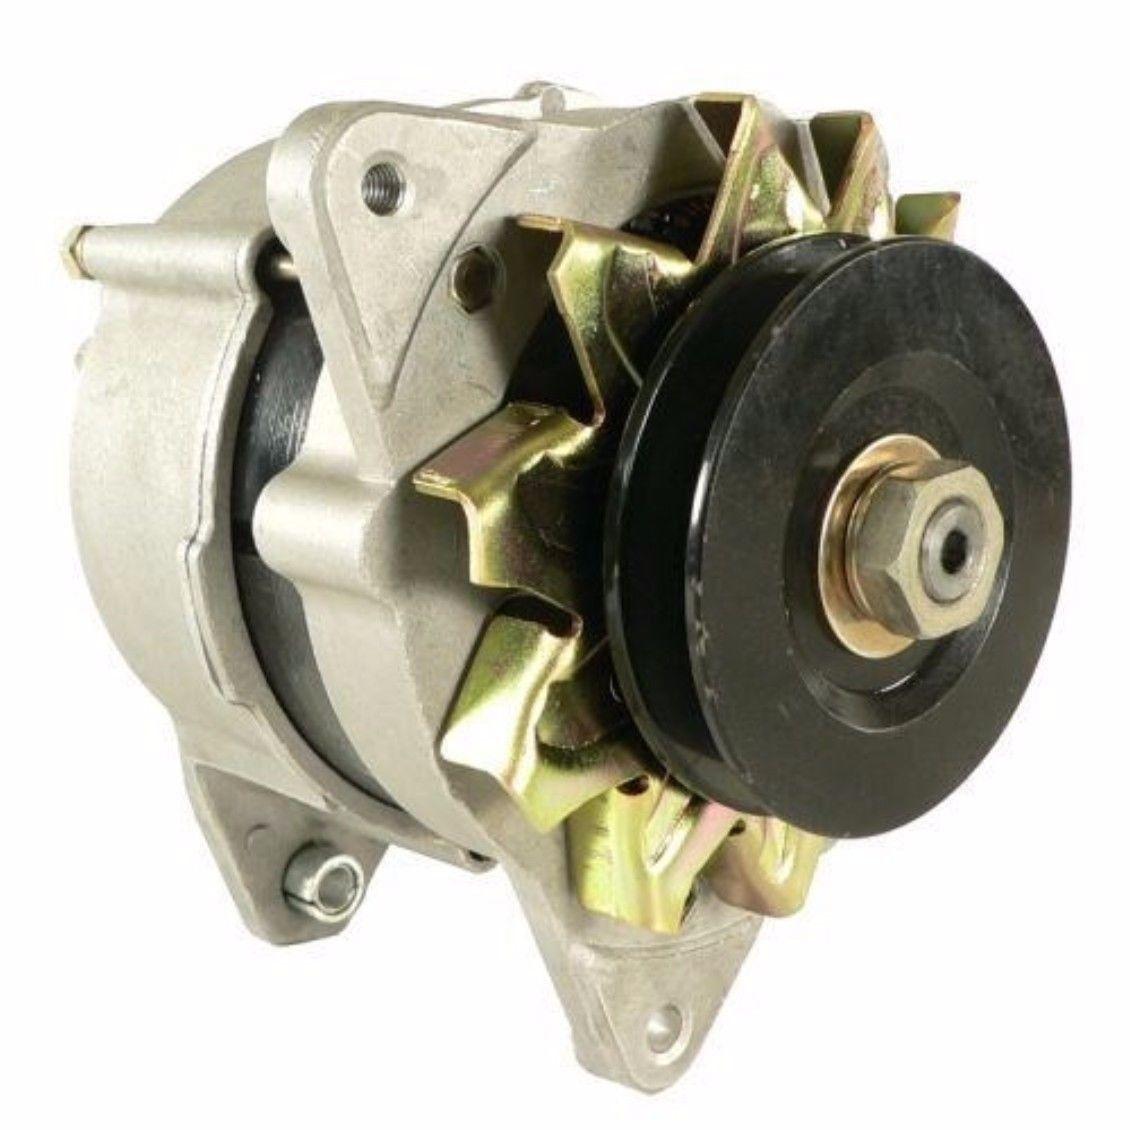 New Alternator K307720 24049 24049d 4 219 6 329 248 Mf 394 360 Massey Ferguson Wiring Diagram 390 12143 Proagplus